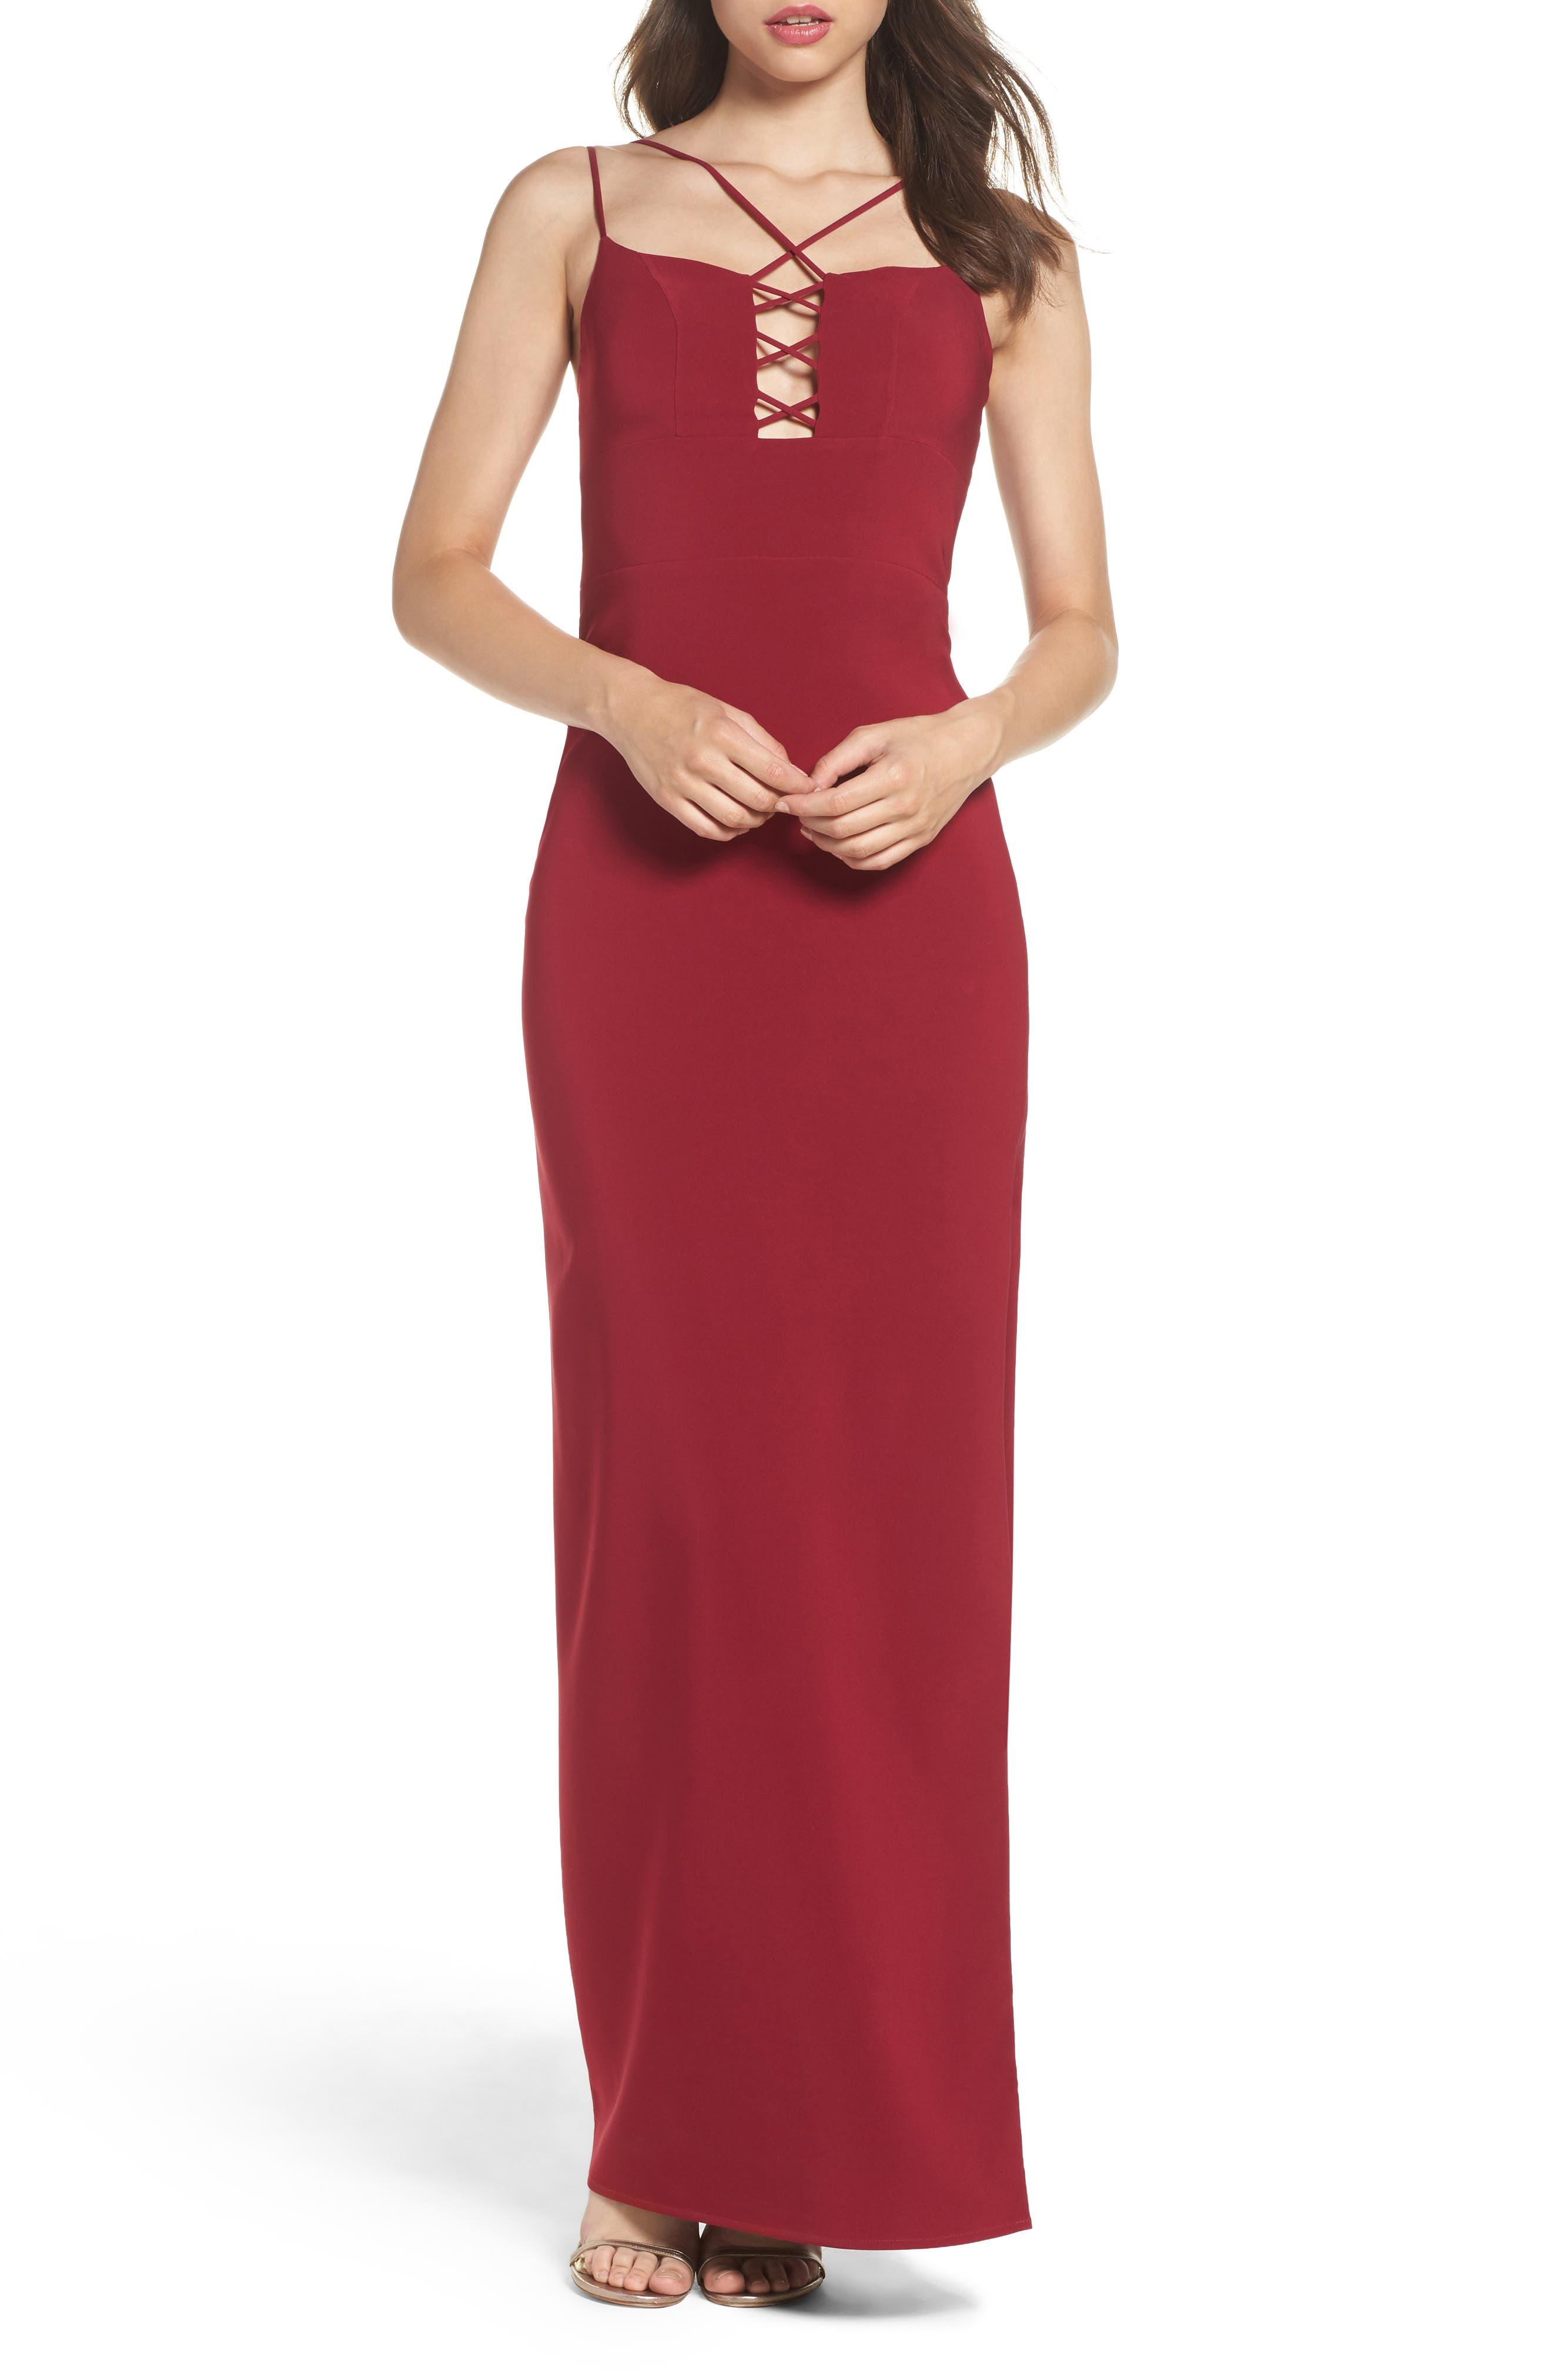 Starlett Gown,                             Main thumbnail 1, color,                             935